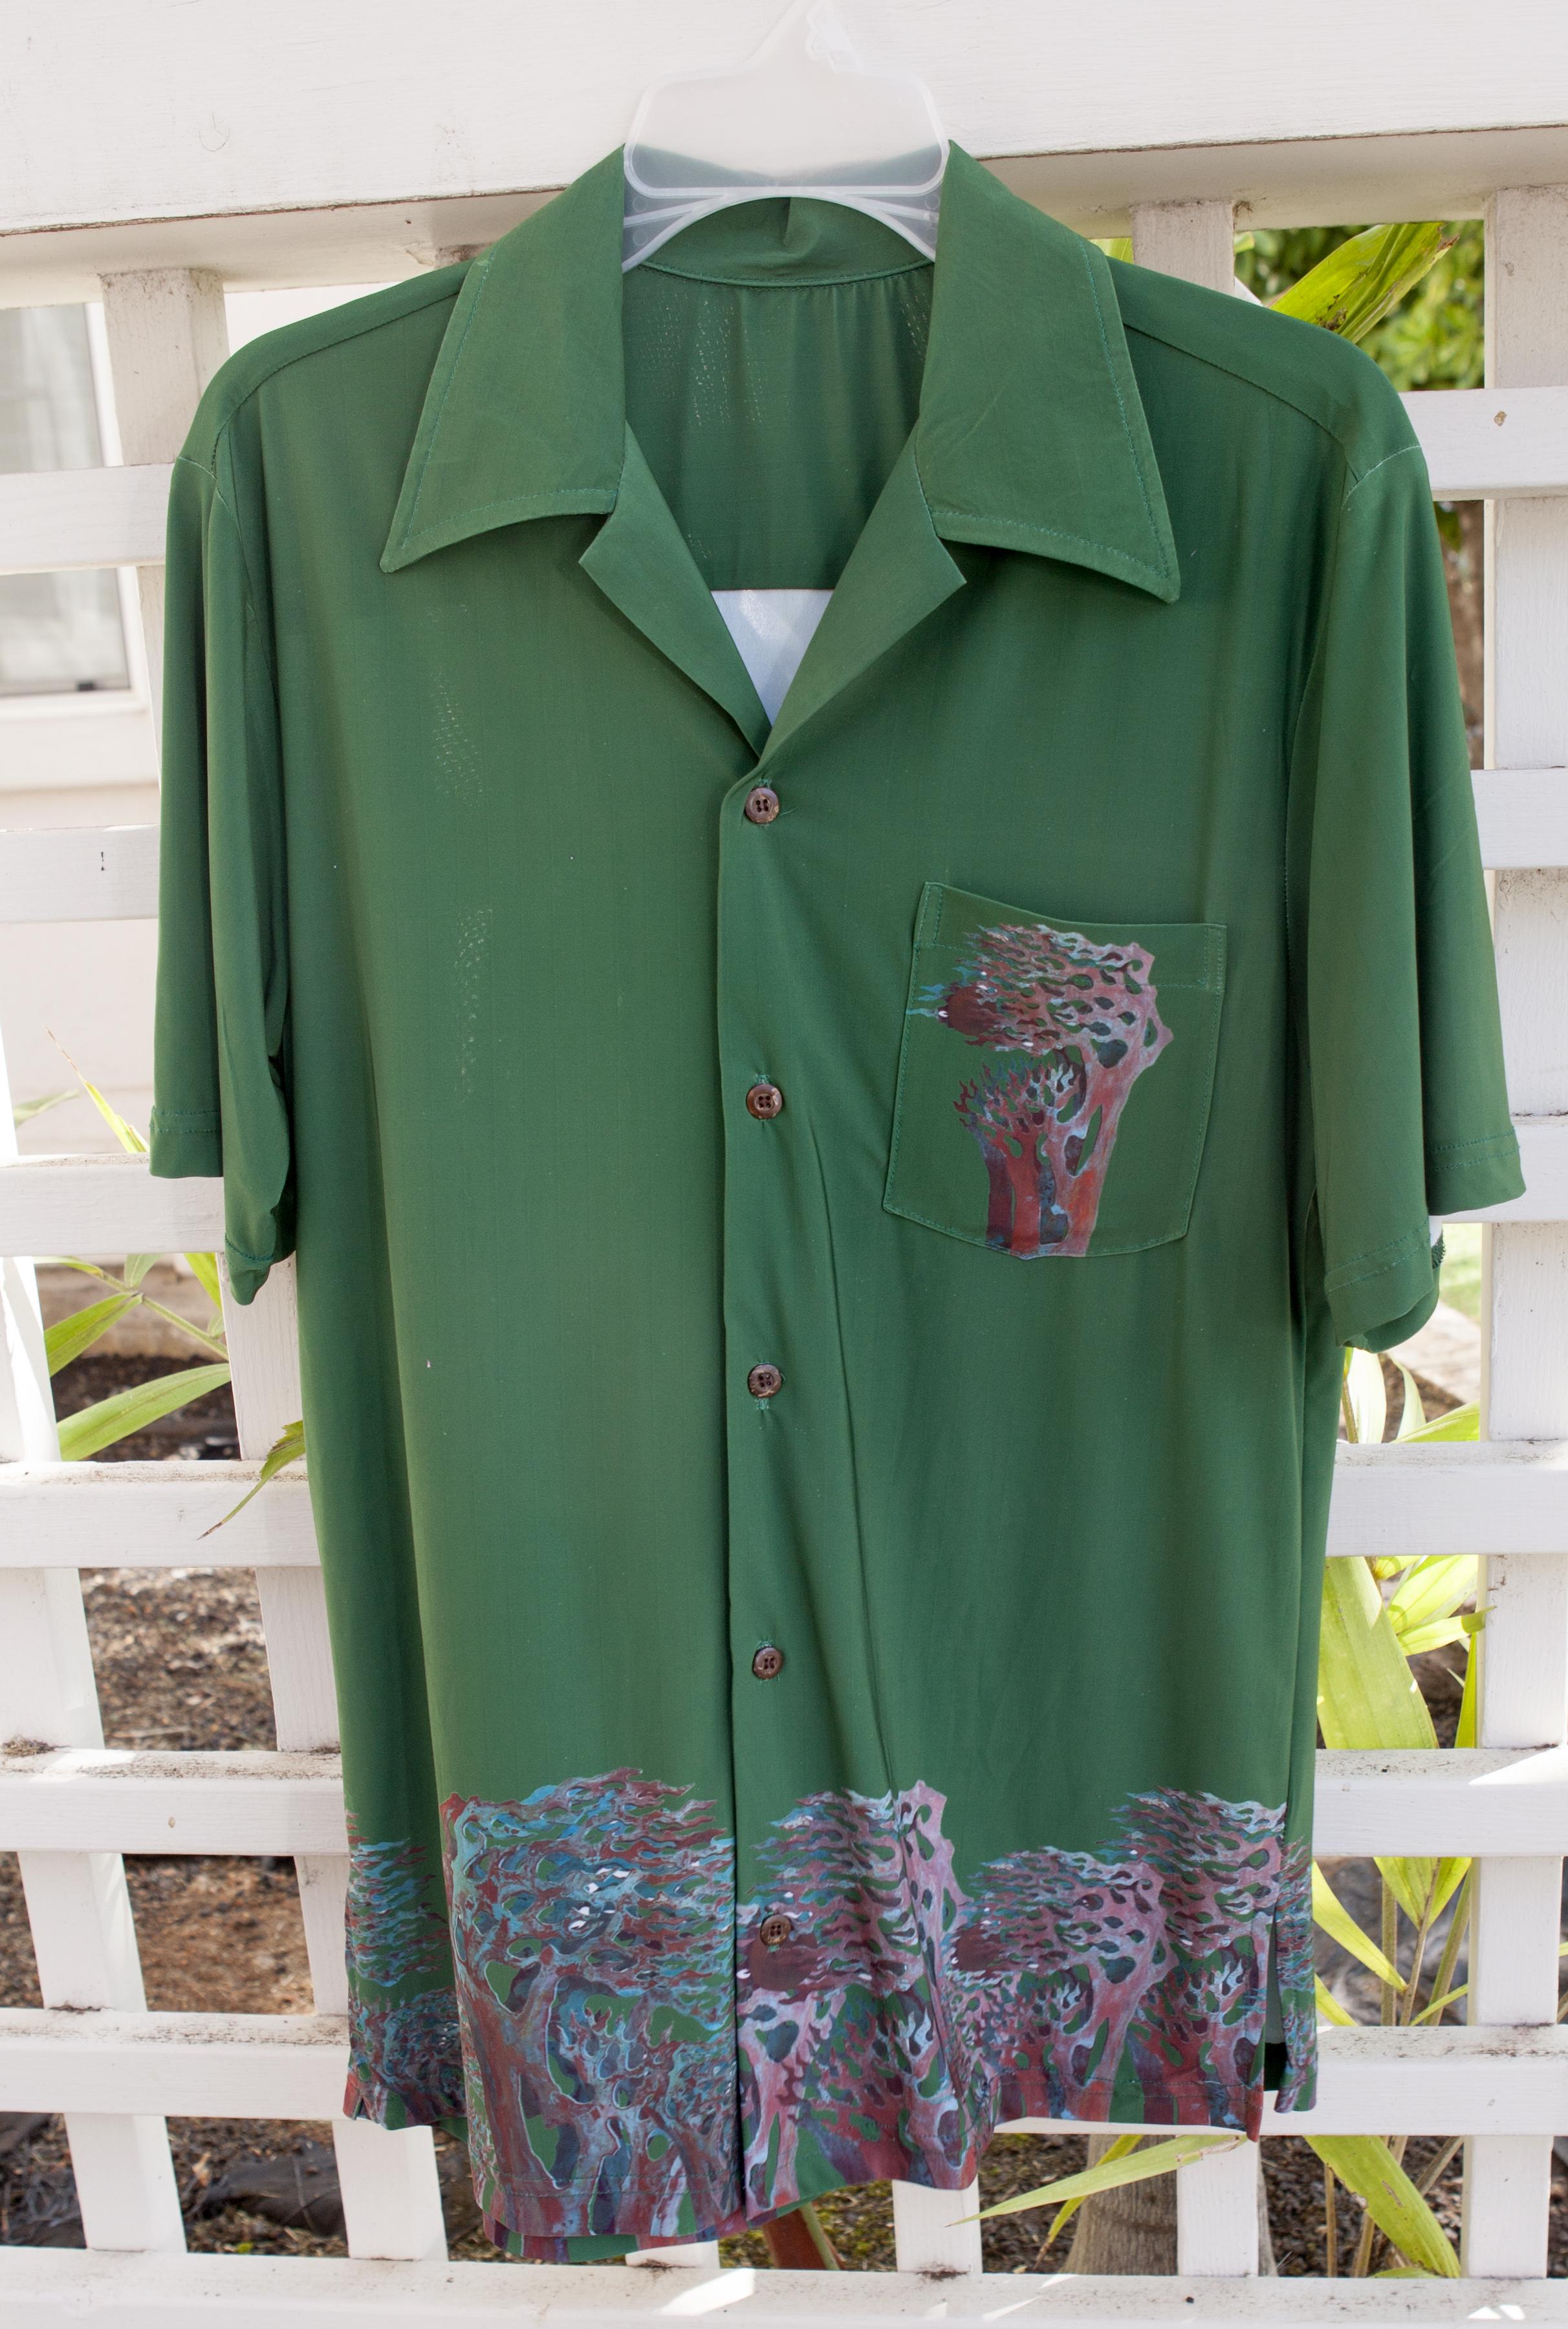 Green Doubletree shirt.jpg